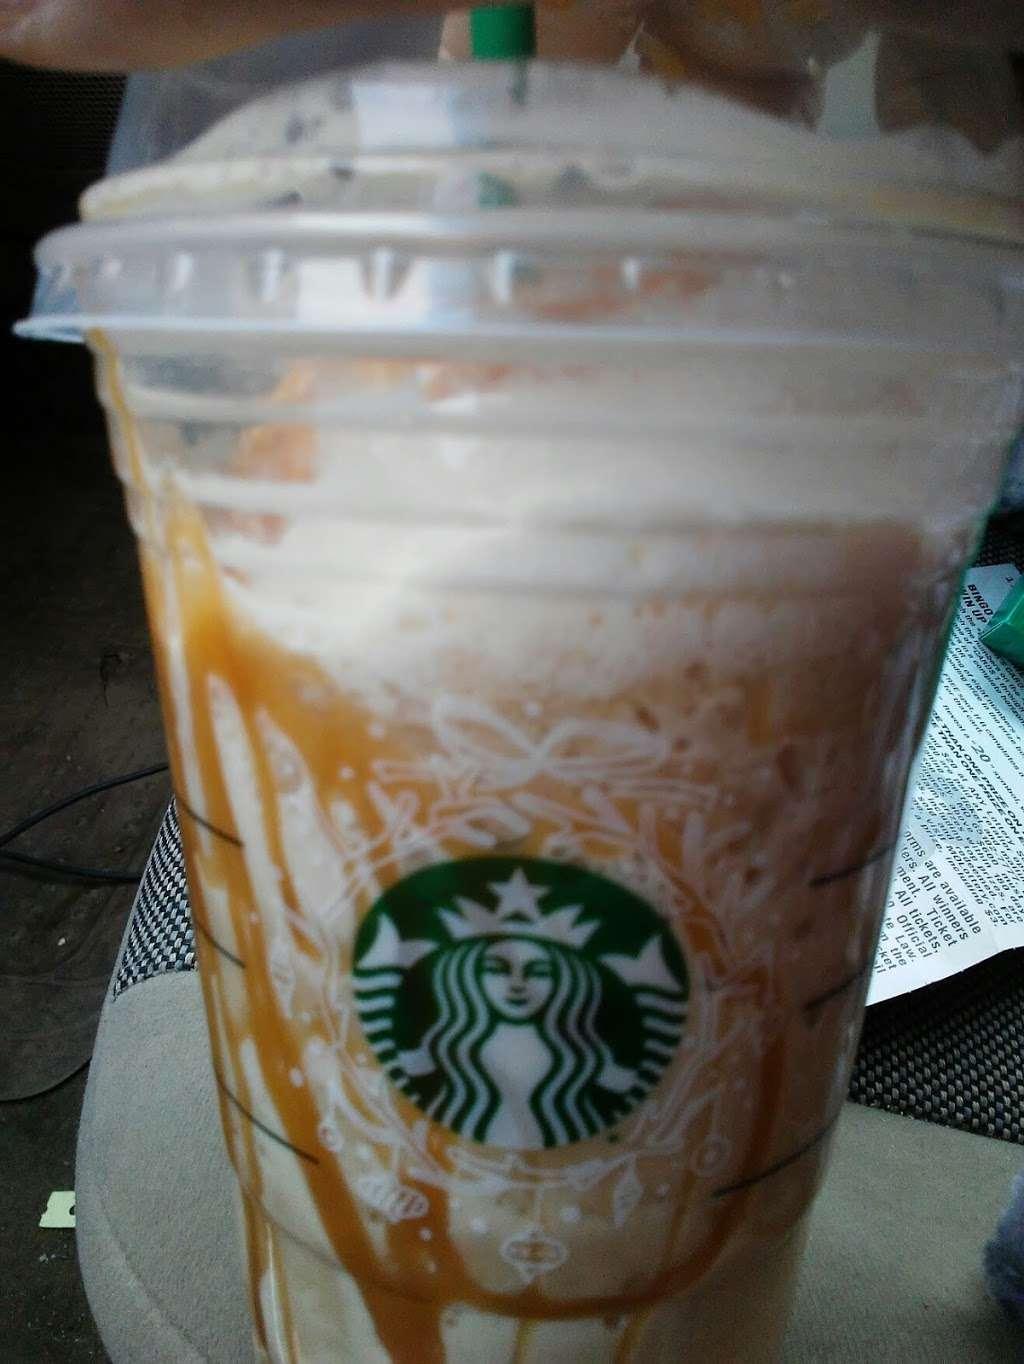 Starbucks - cafe  | Photo 9 of 10 | Address: 8801 Metcalf Ave, Overland Park, KS 66212, USA | Phone: (913) 642-2588